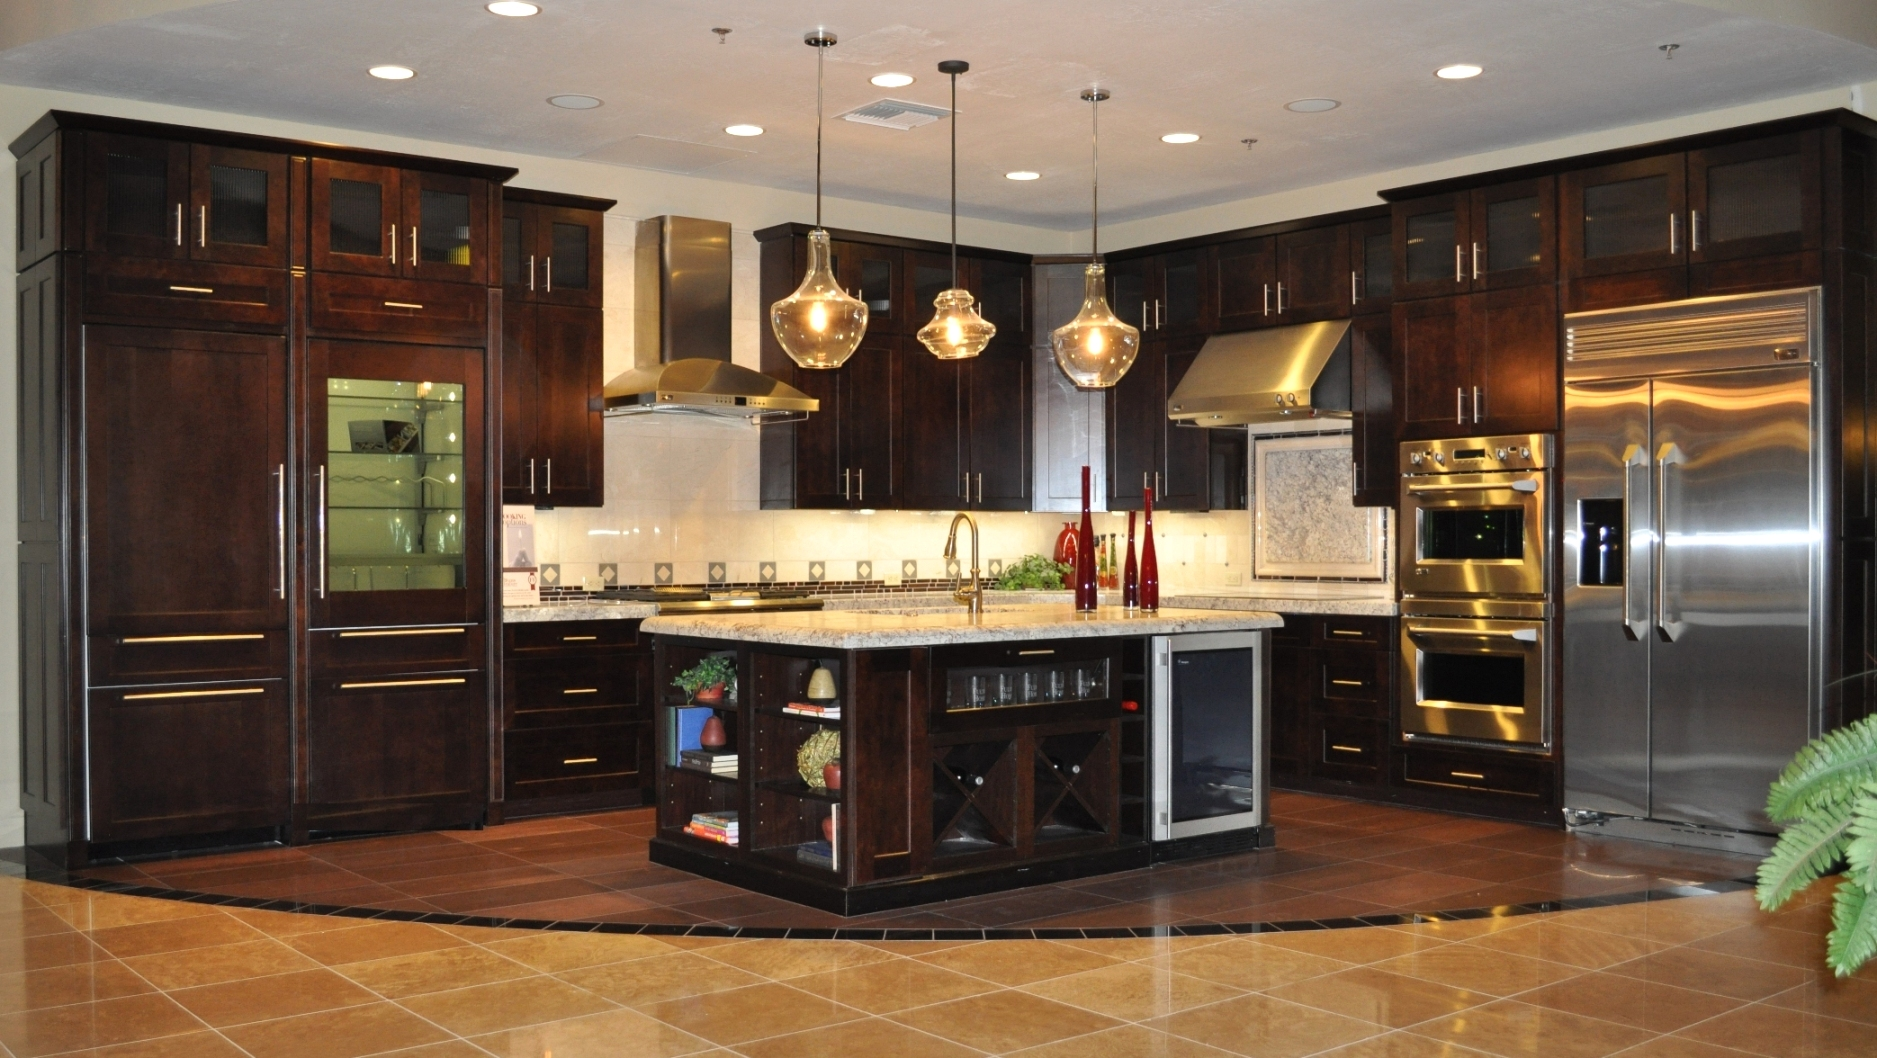 lovable kitchen ceiling lights ideas appealing elegant. lovable kitchen ceiling lights ideas appealing elegant large pendant photo album garden and l